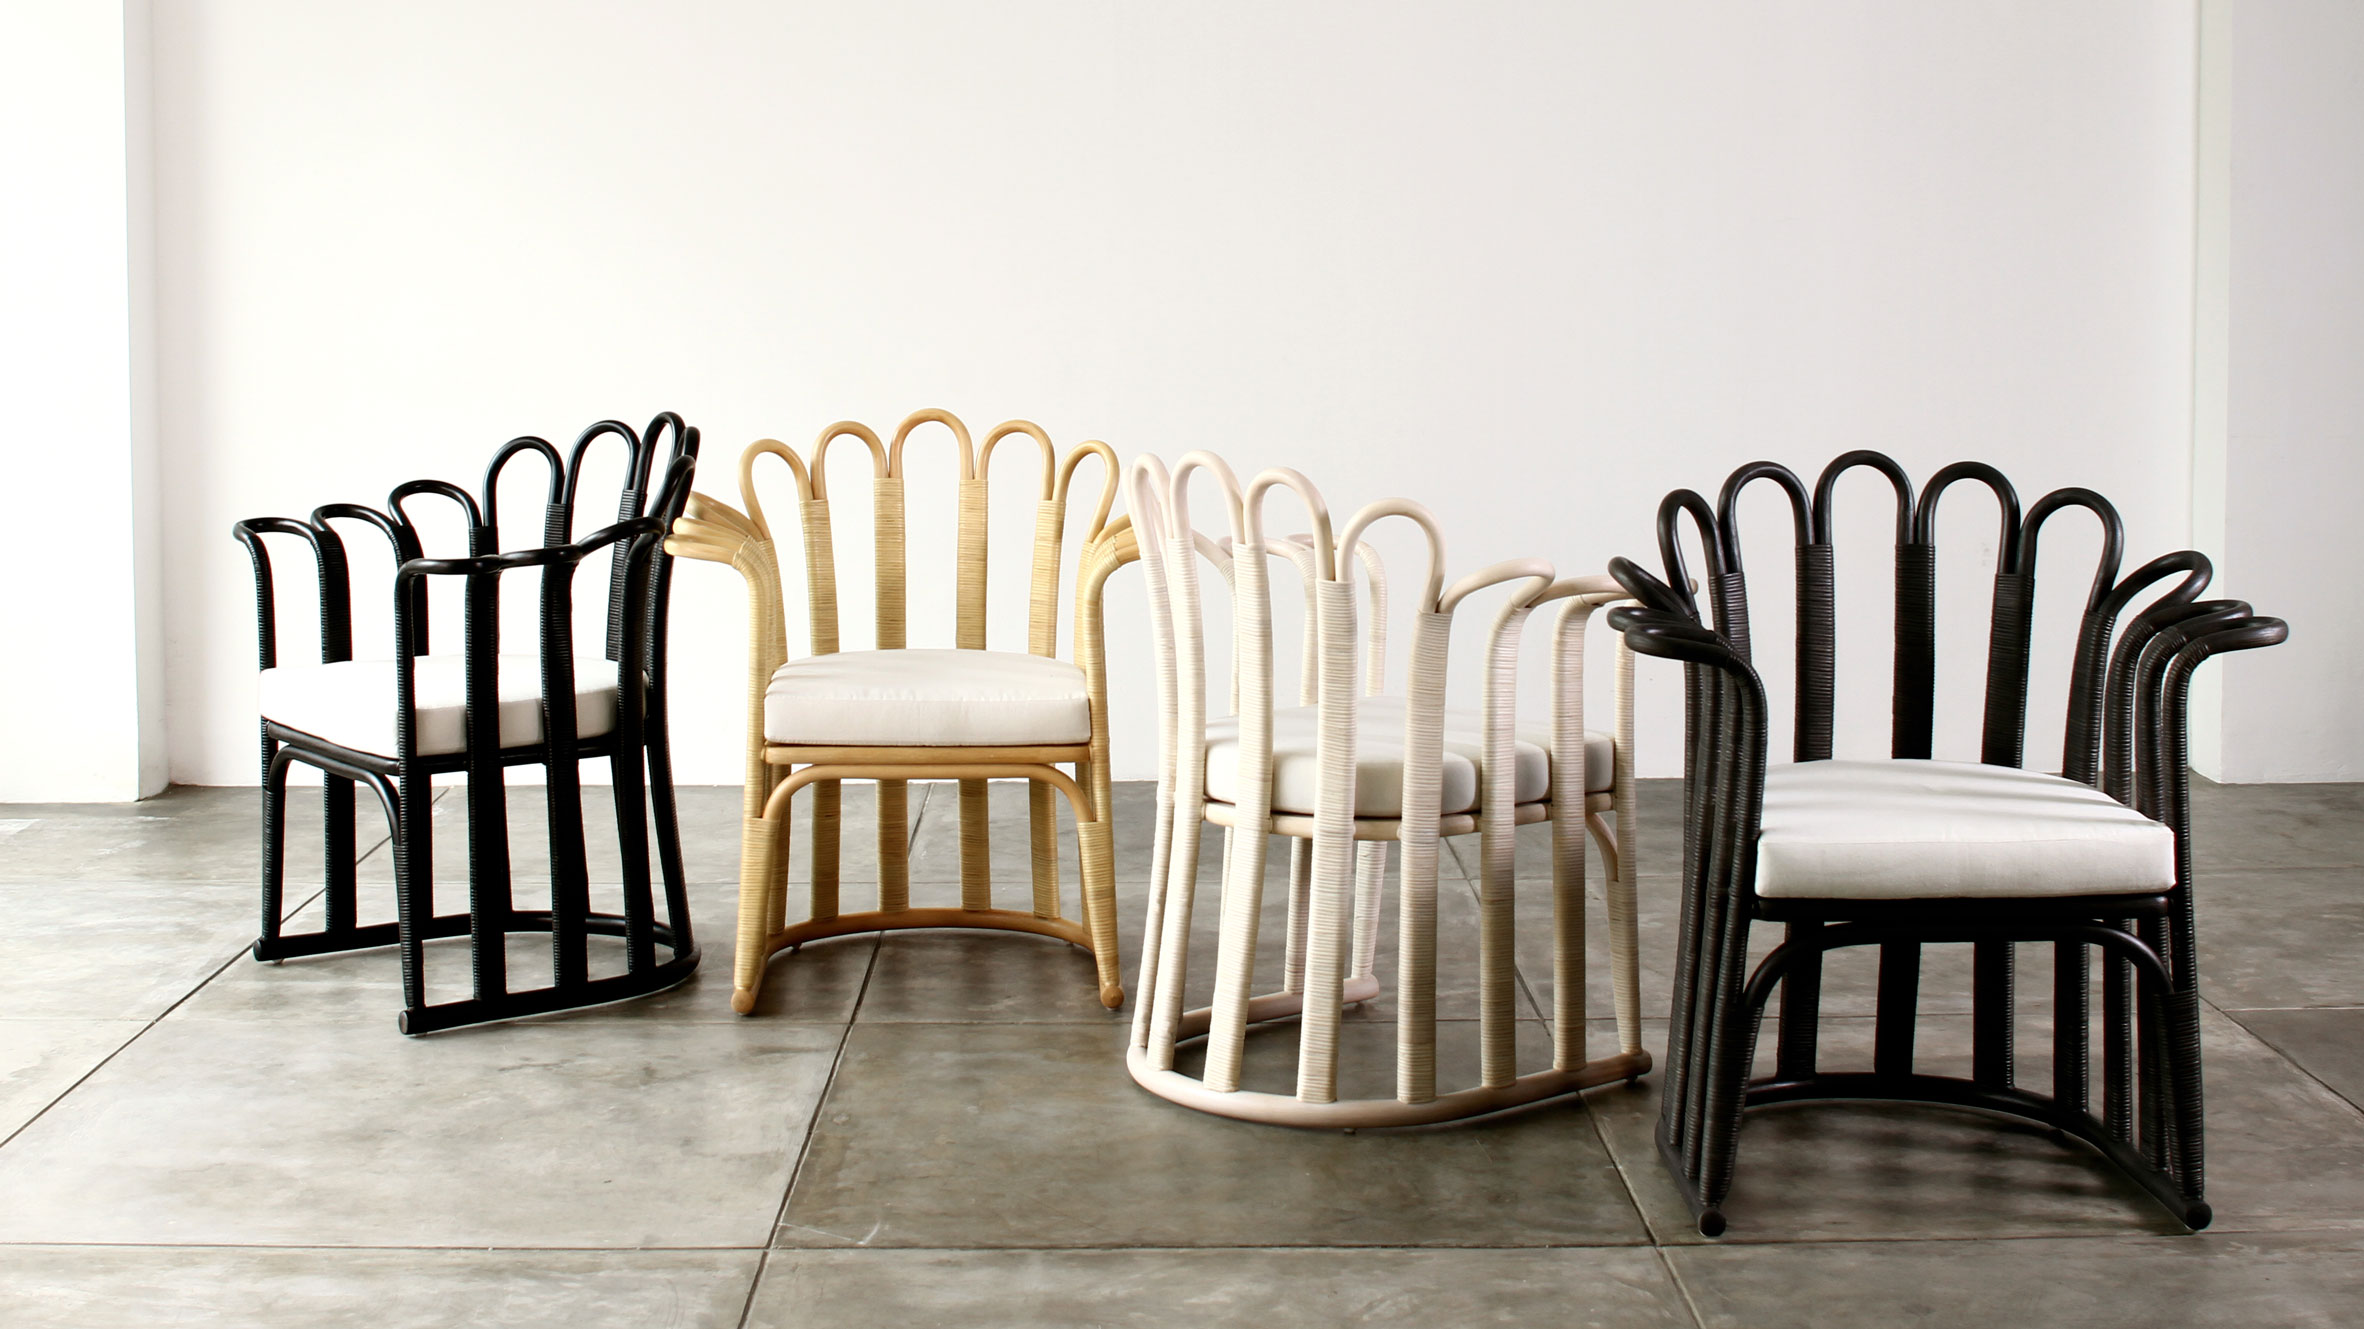 Tropicália Modernity rattan furniture by Alvin T at Milan design week